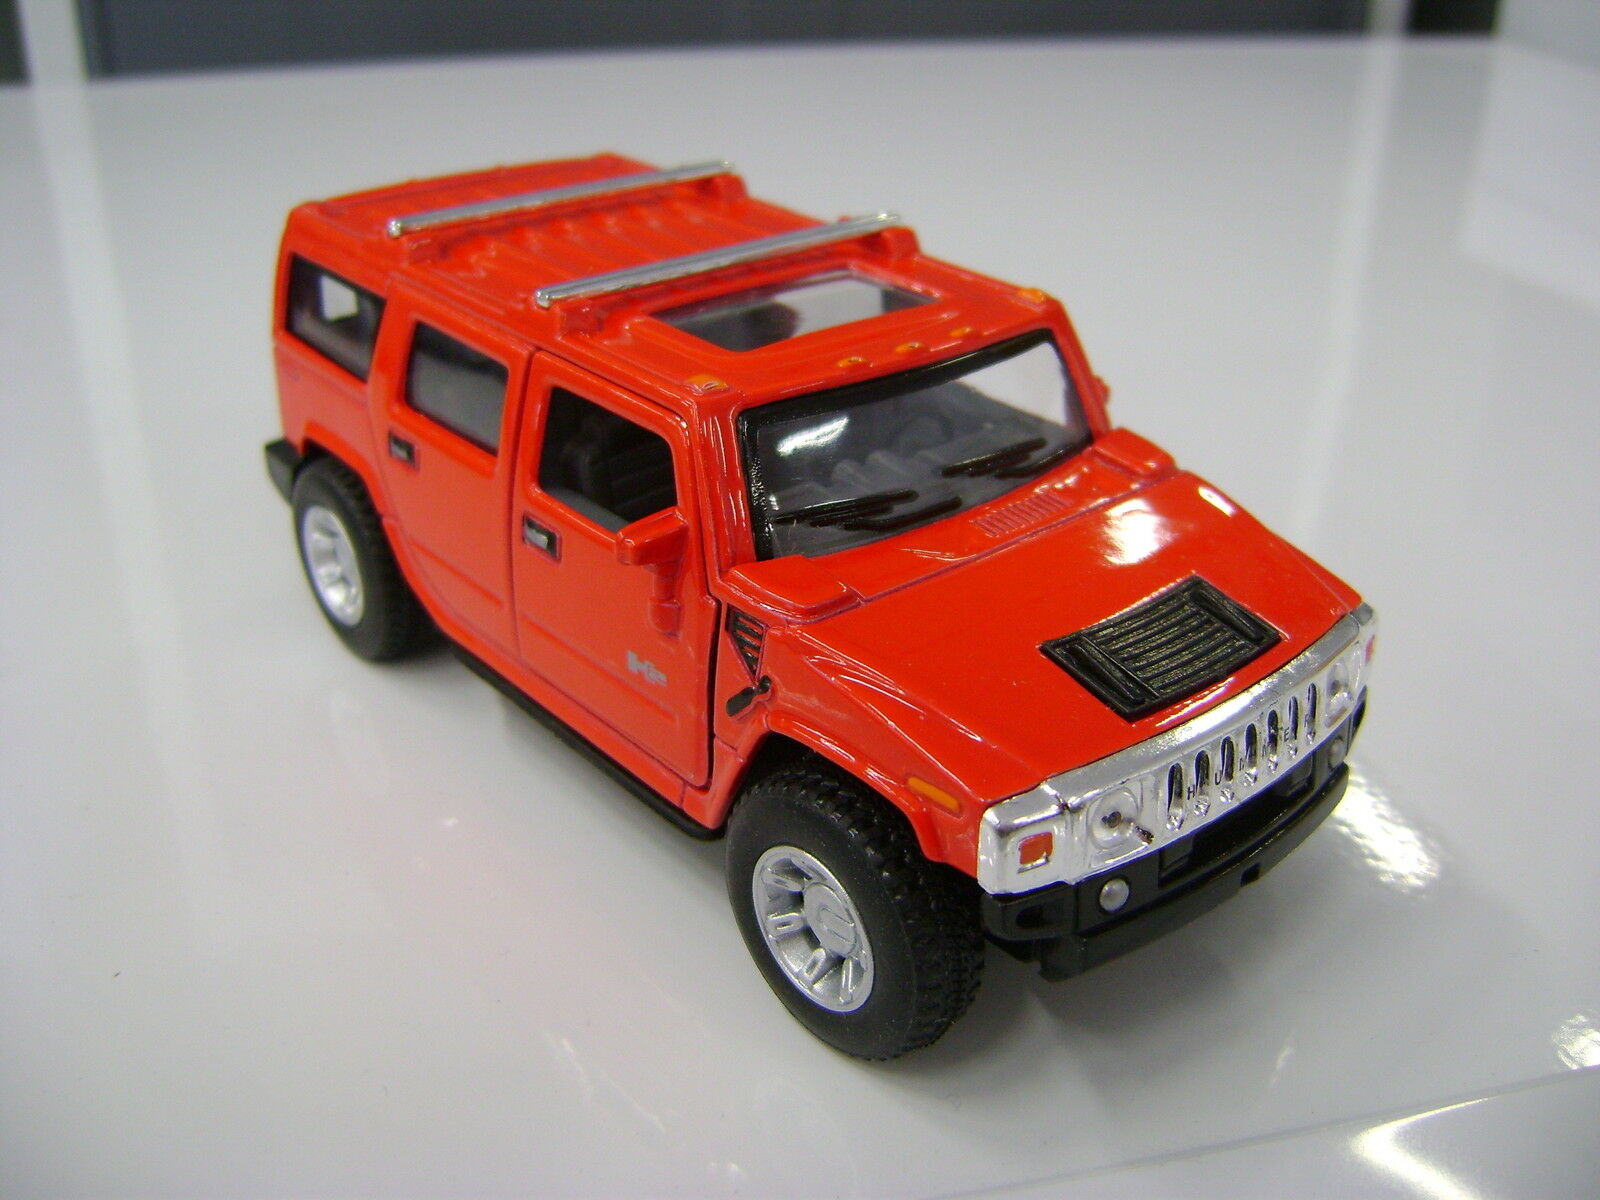 2008 Hummer H2 SUV Rot Kinsmart Spielzeug Modell 1 40 40 40 Maßstab 5262c8